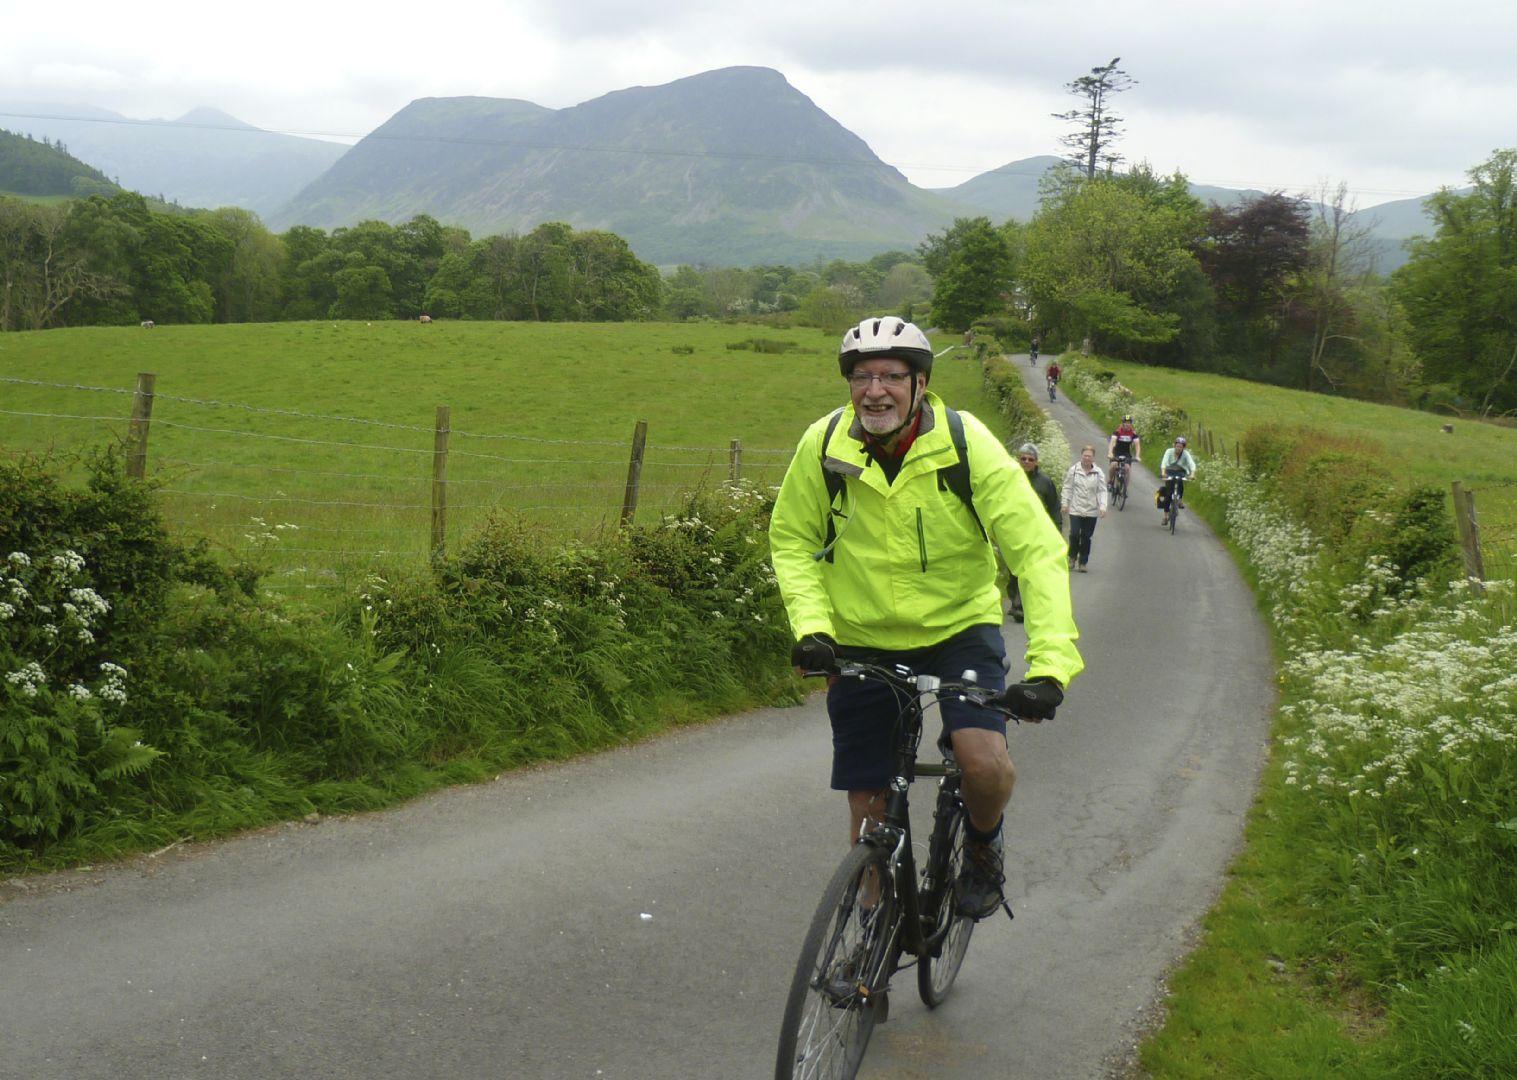 P1020379.jpg - UK - C2C - Coast to Coast 4 Days Cycling - Self-Guided Leisure Cycling Holiday - Leisure Cycling